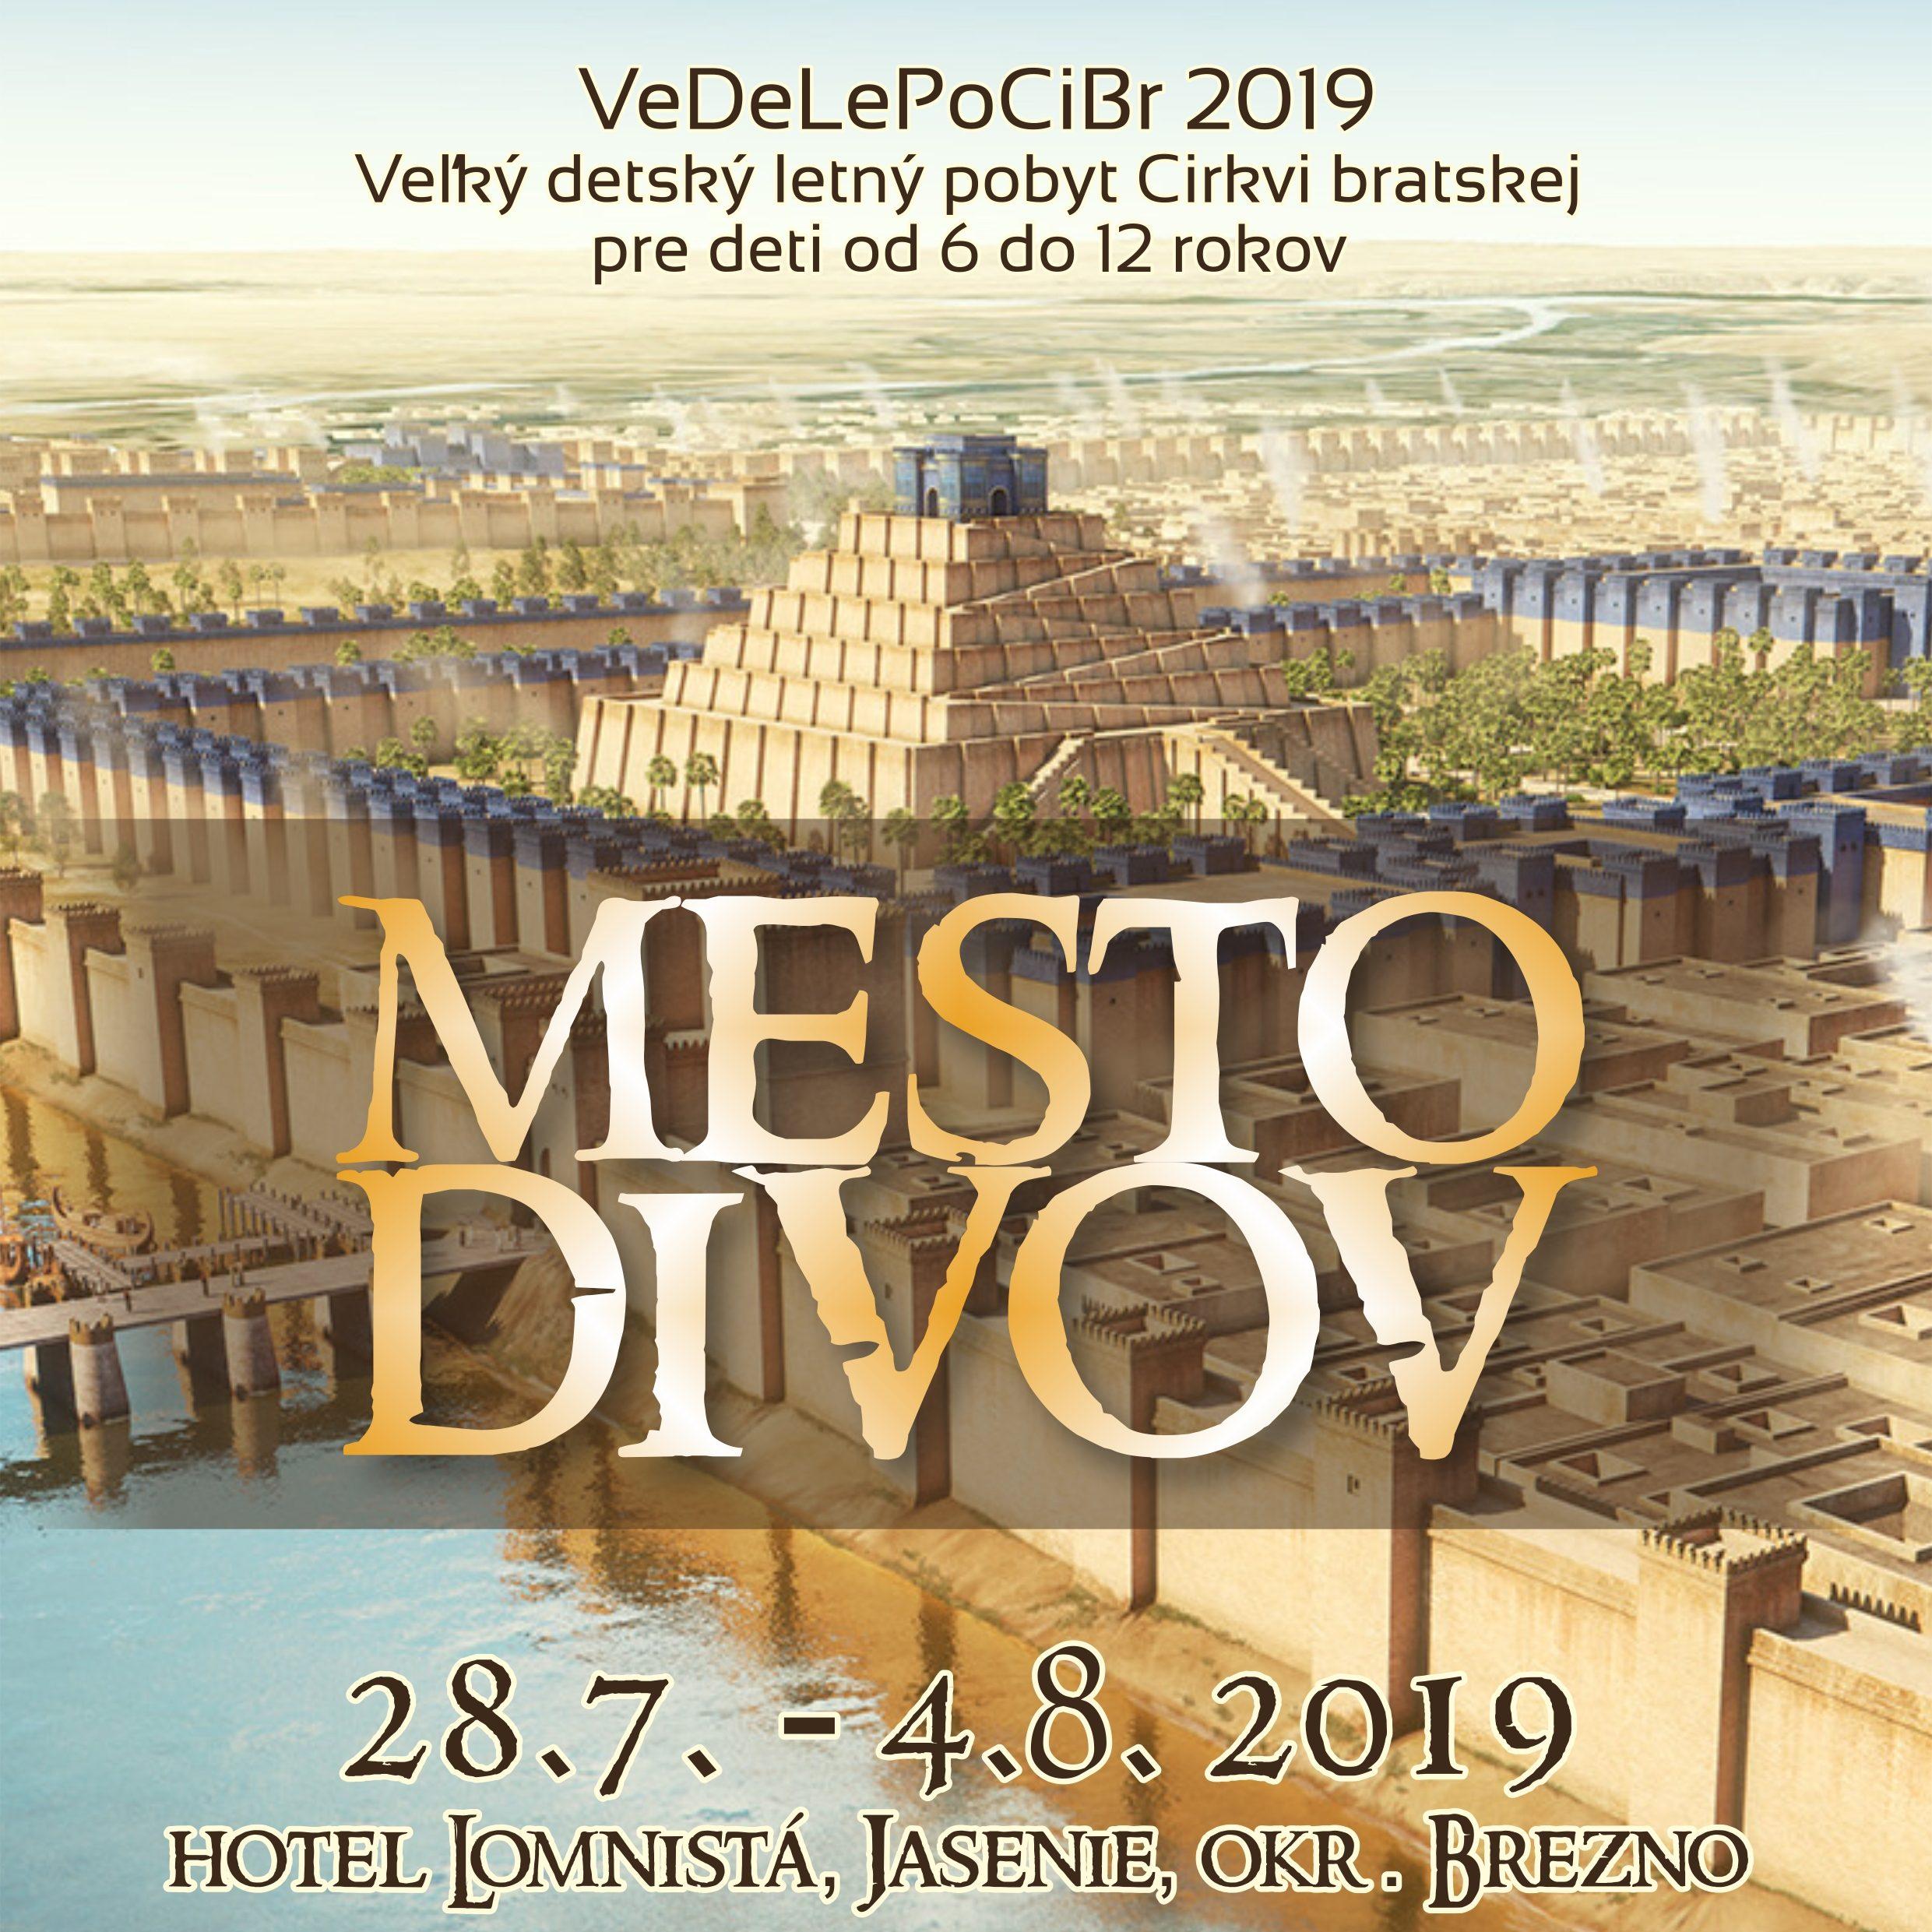 VeDeLePoCiBr 2019